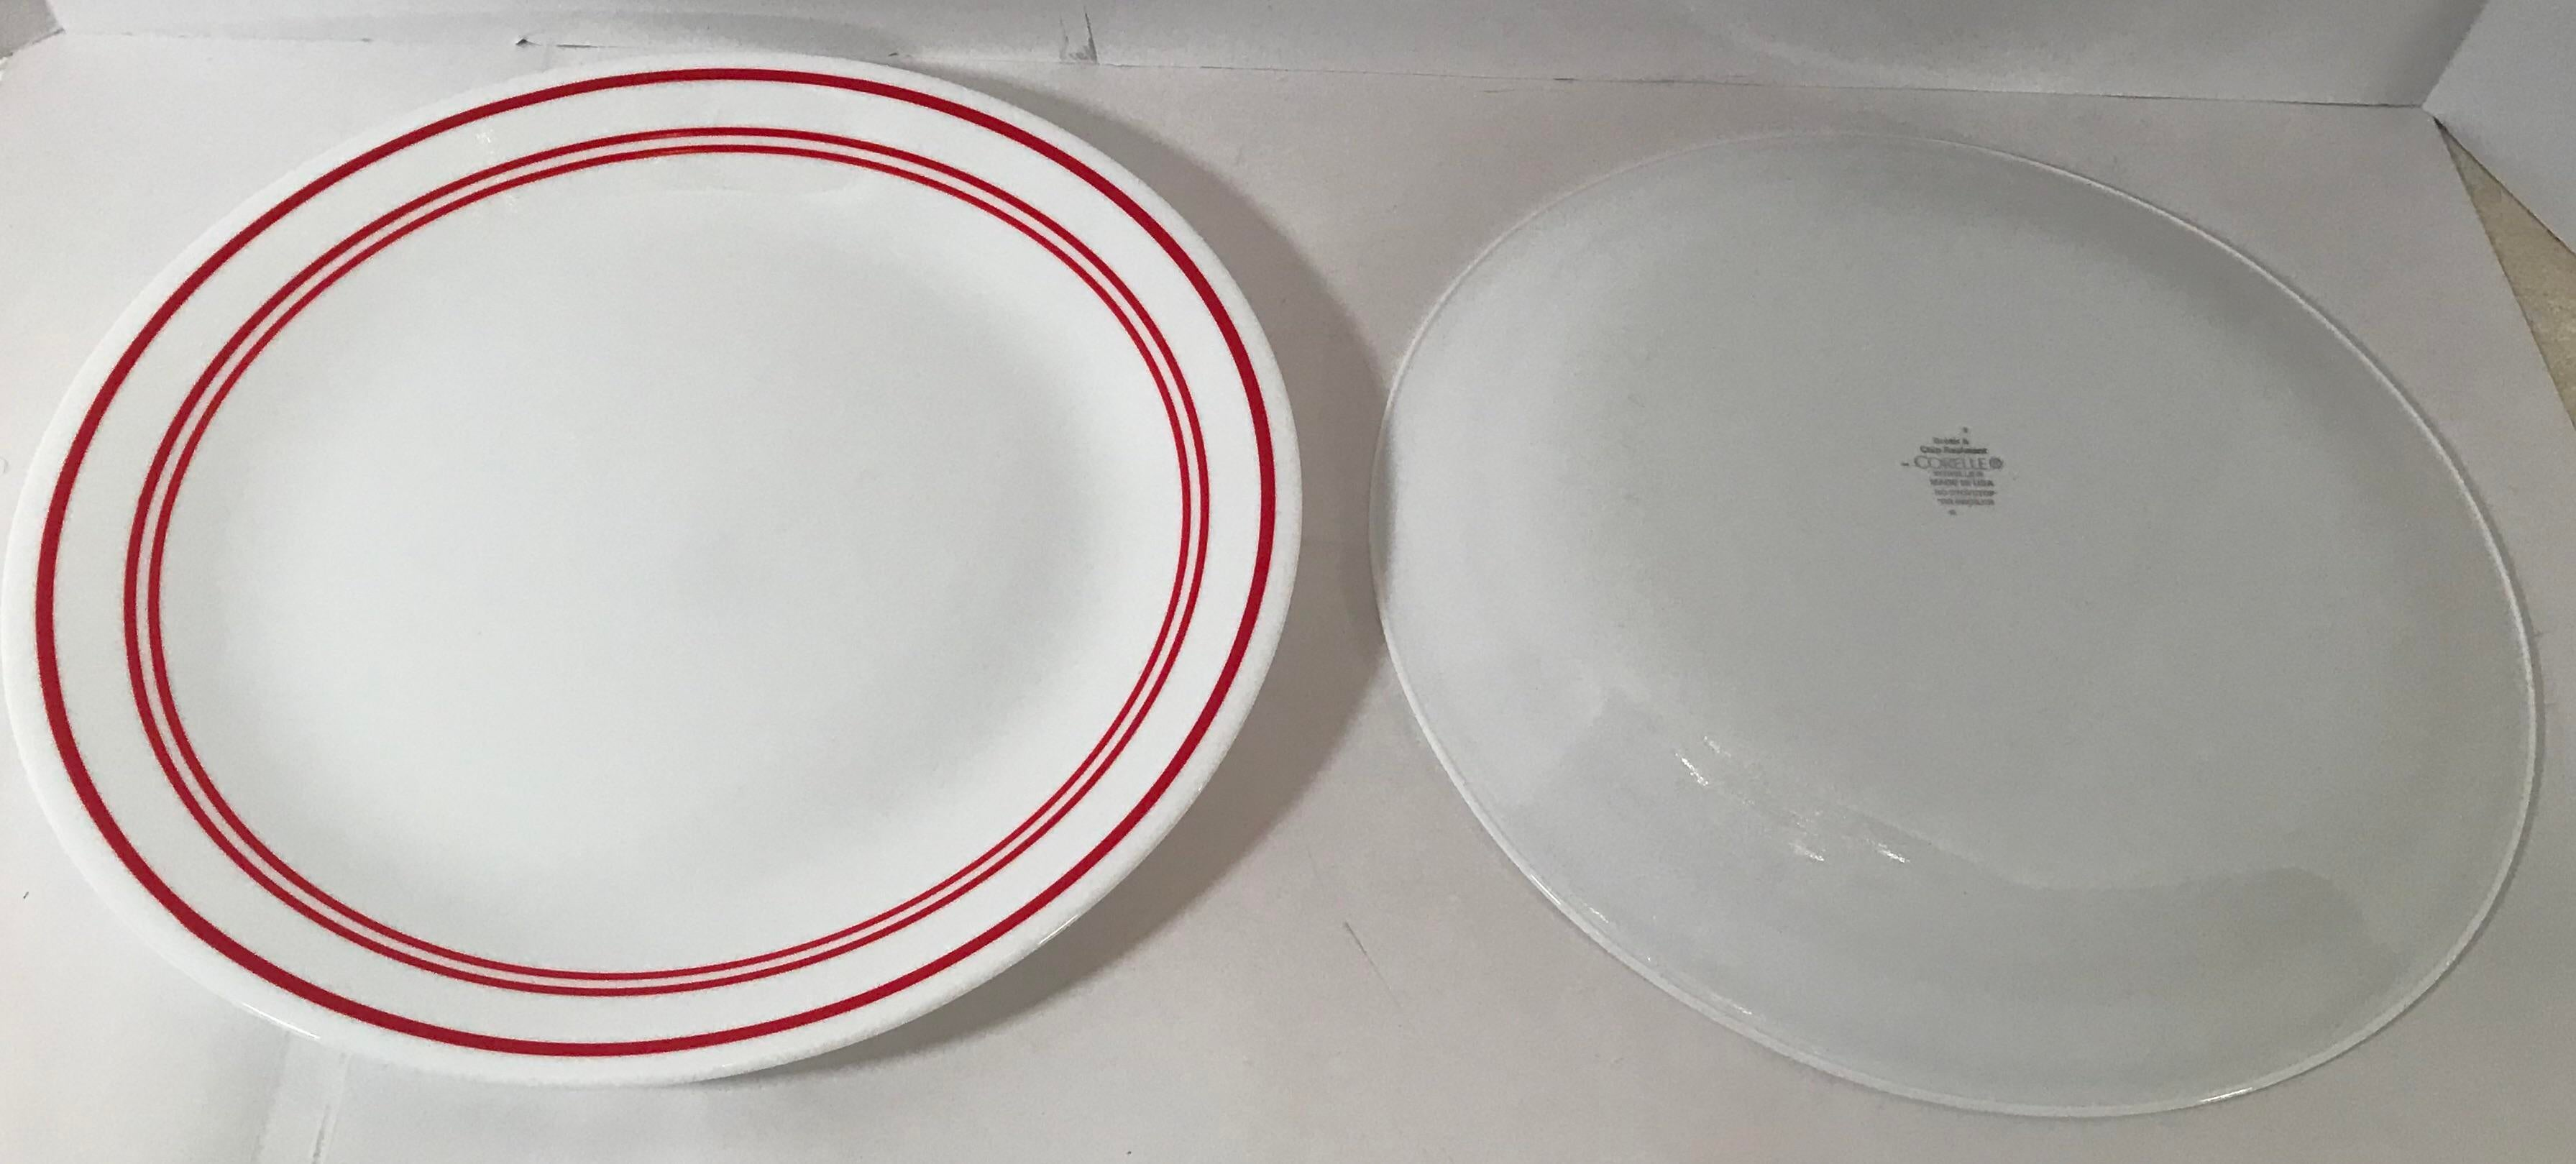 Vintage Red Stripe u0026 White Corelle Dinnerware -Set of 14 - Image 9 of 11  sc 1 st  Chairish & Vintage Red Stripe u0026 White Corelle Dinnerware -Set of 14 | Chairish